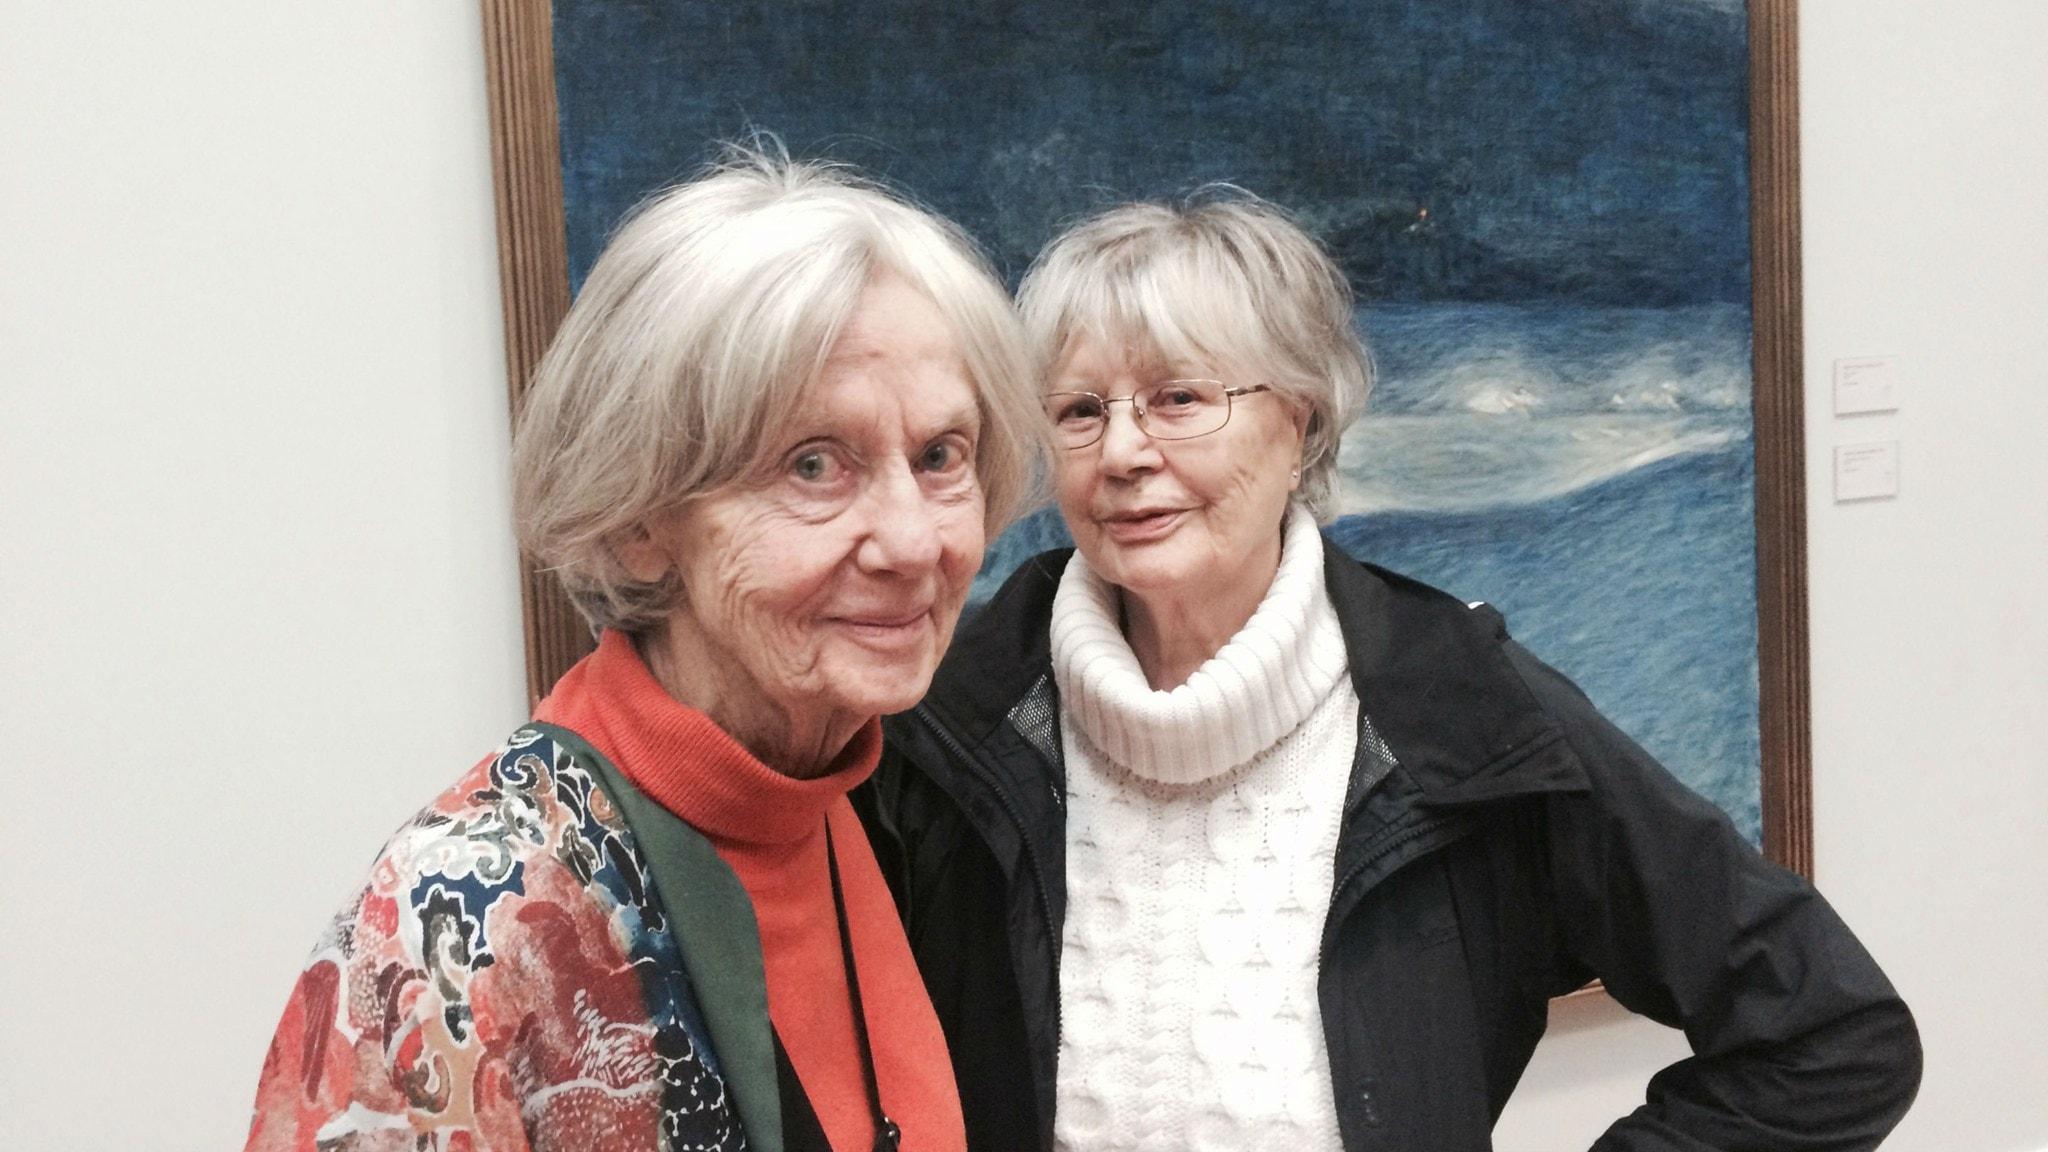 Inga Landgré och Harriet Andersson. Foto: Lisa Bergström